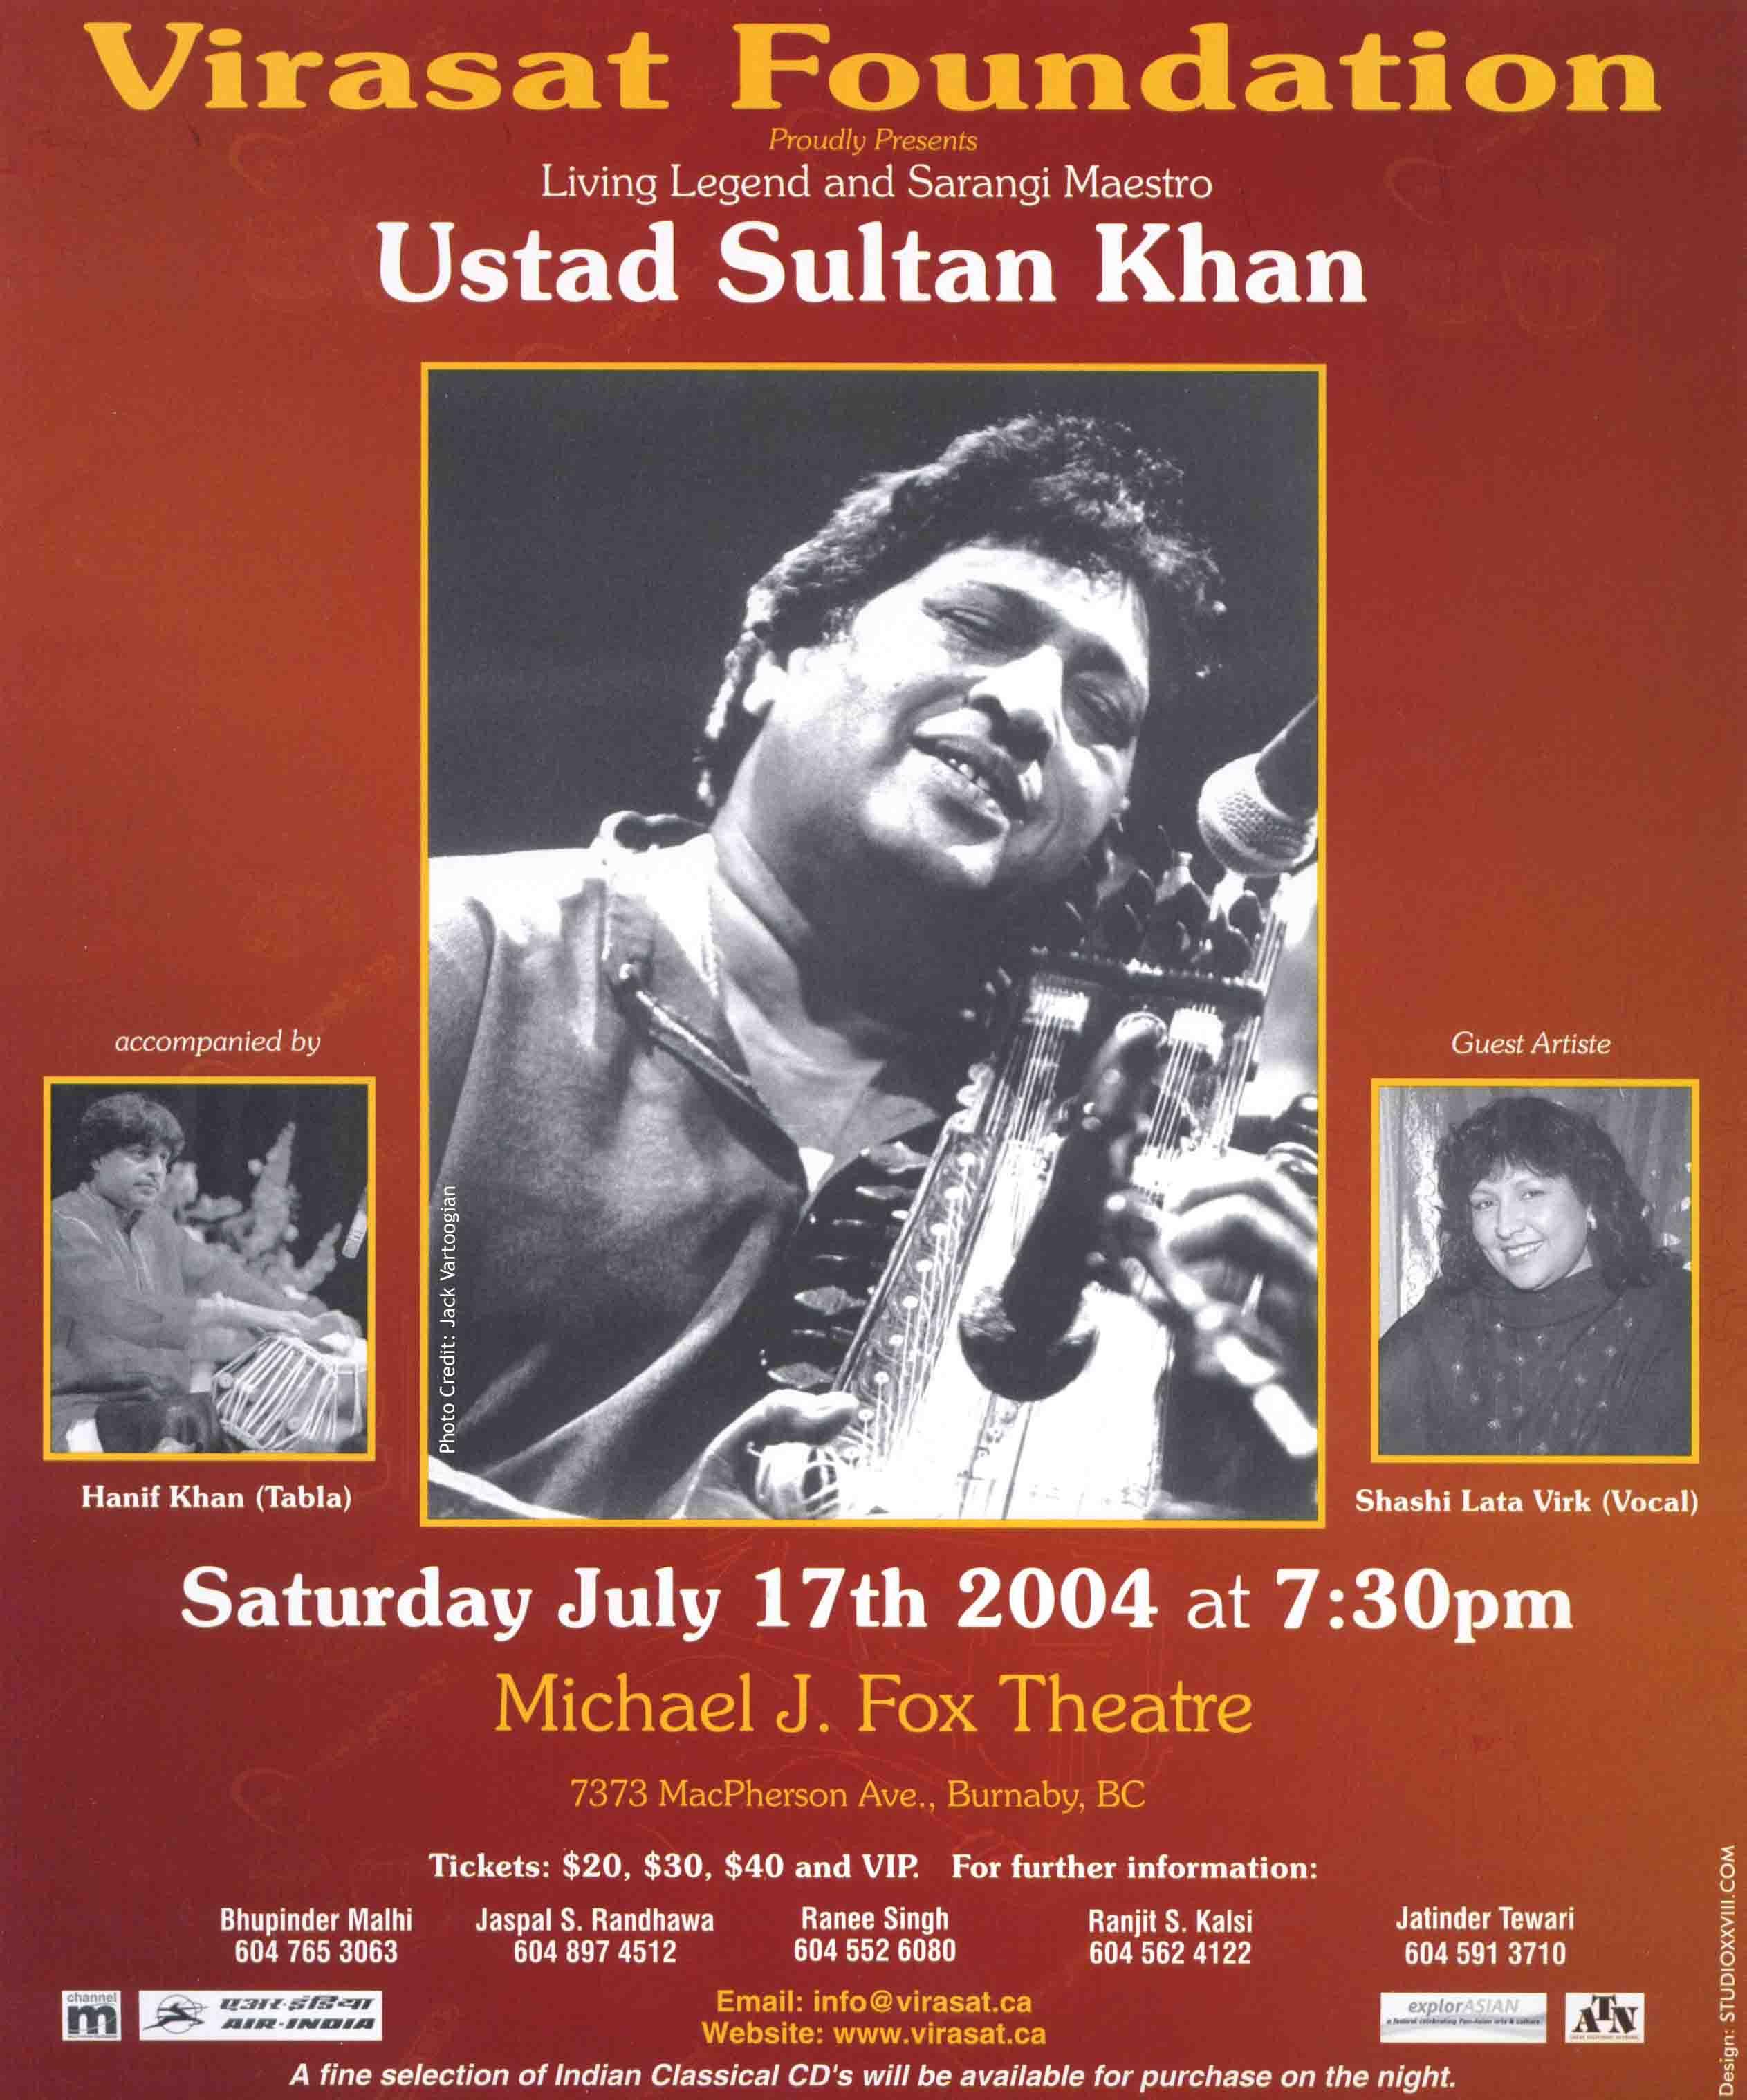 Sarangi Maestro Ustad Sultan Khan